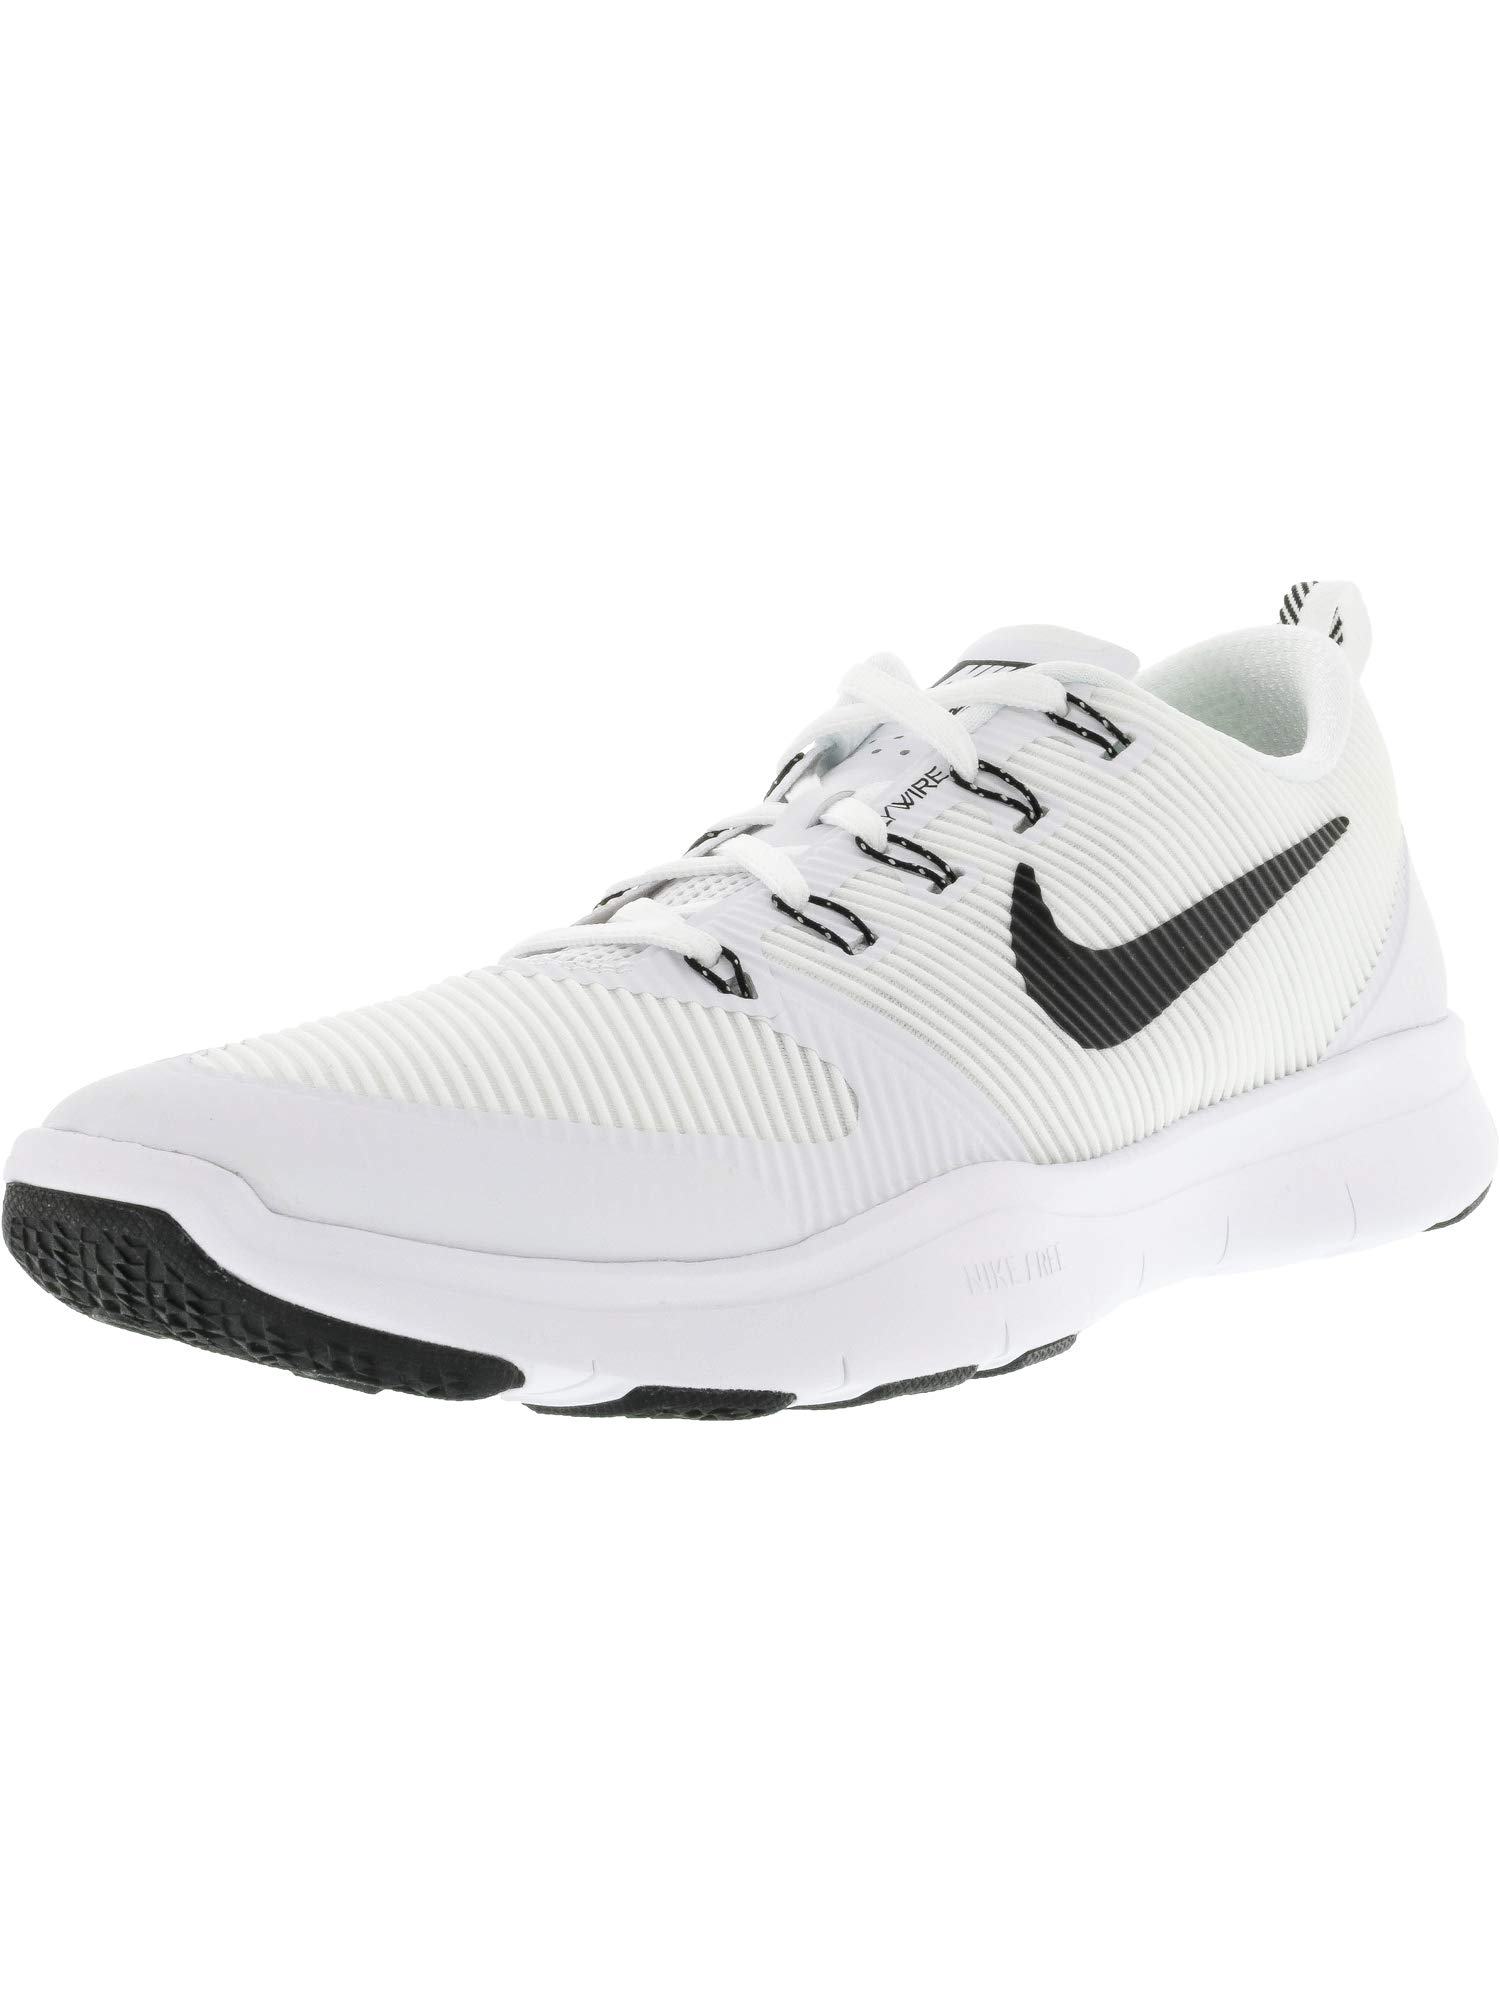 size 40 2ba2c 30331 Galleon - Nike Free Train Versatility TB Running Shoes 833257 100 White  Black Size 15